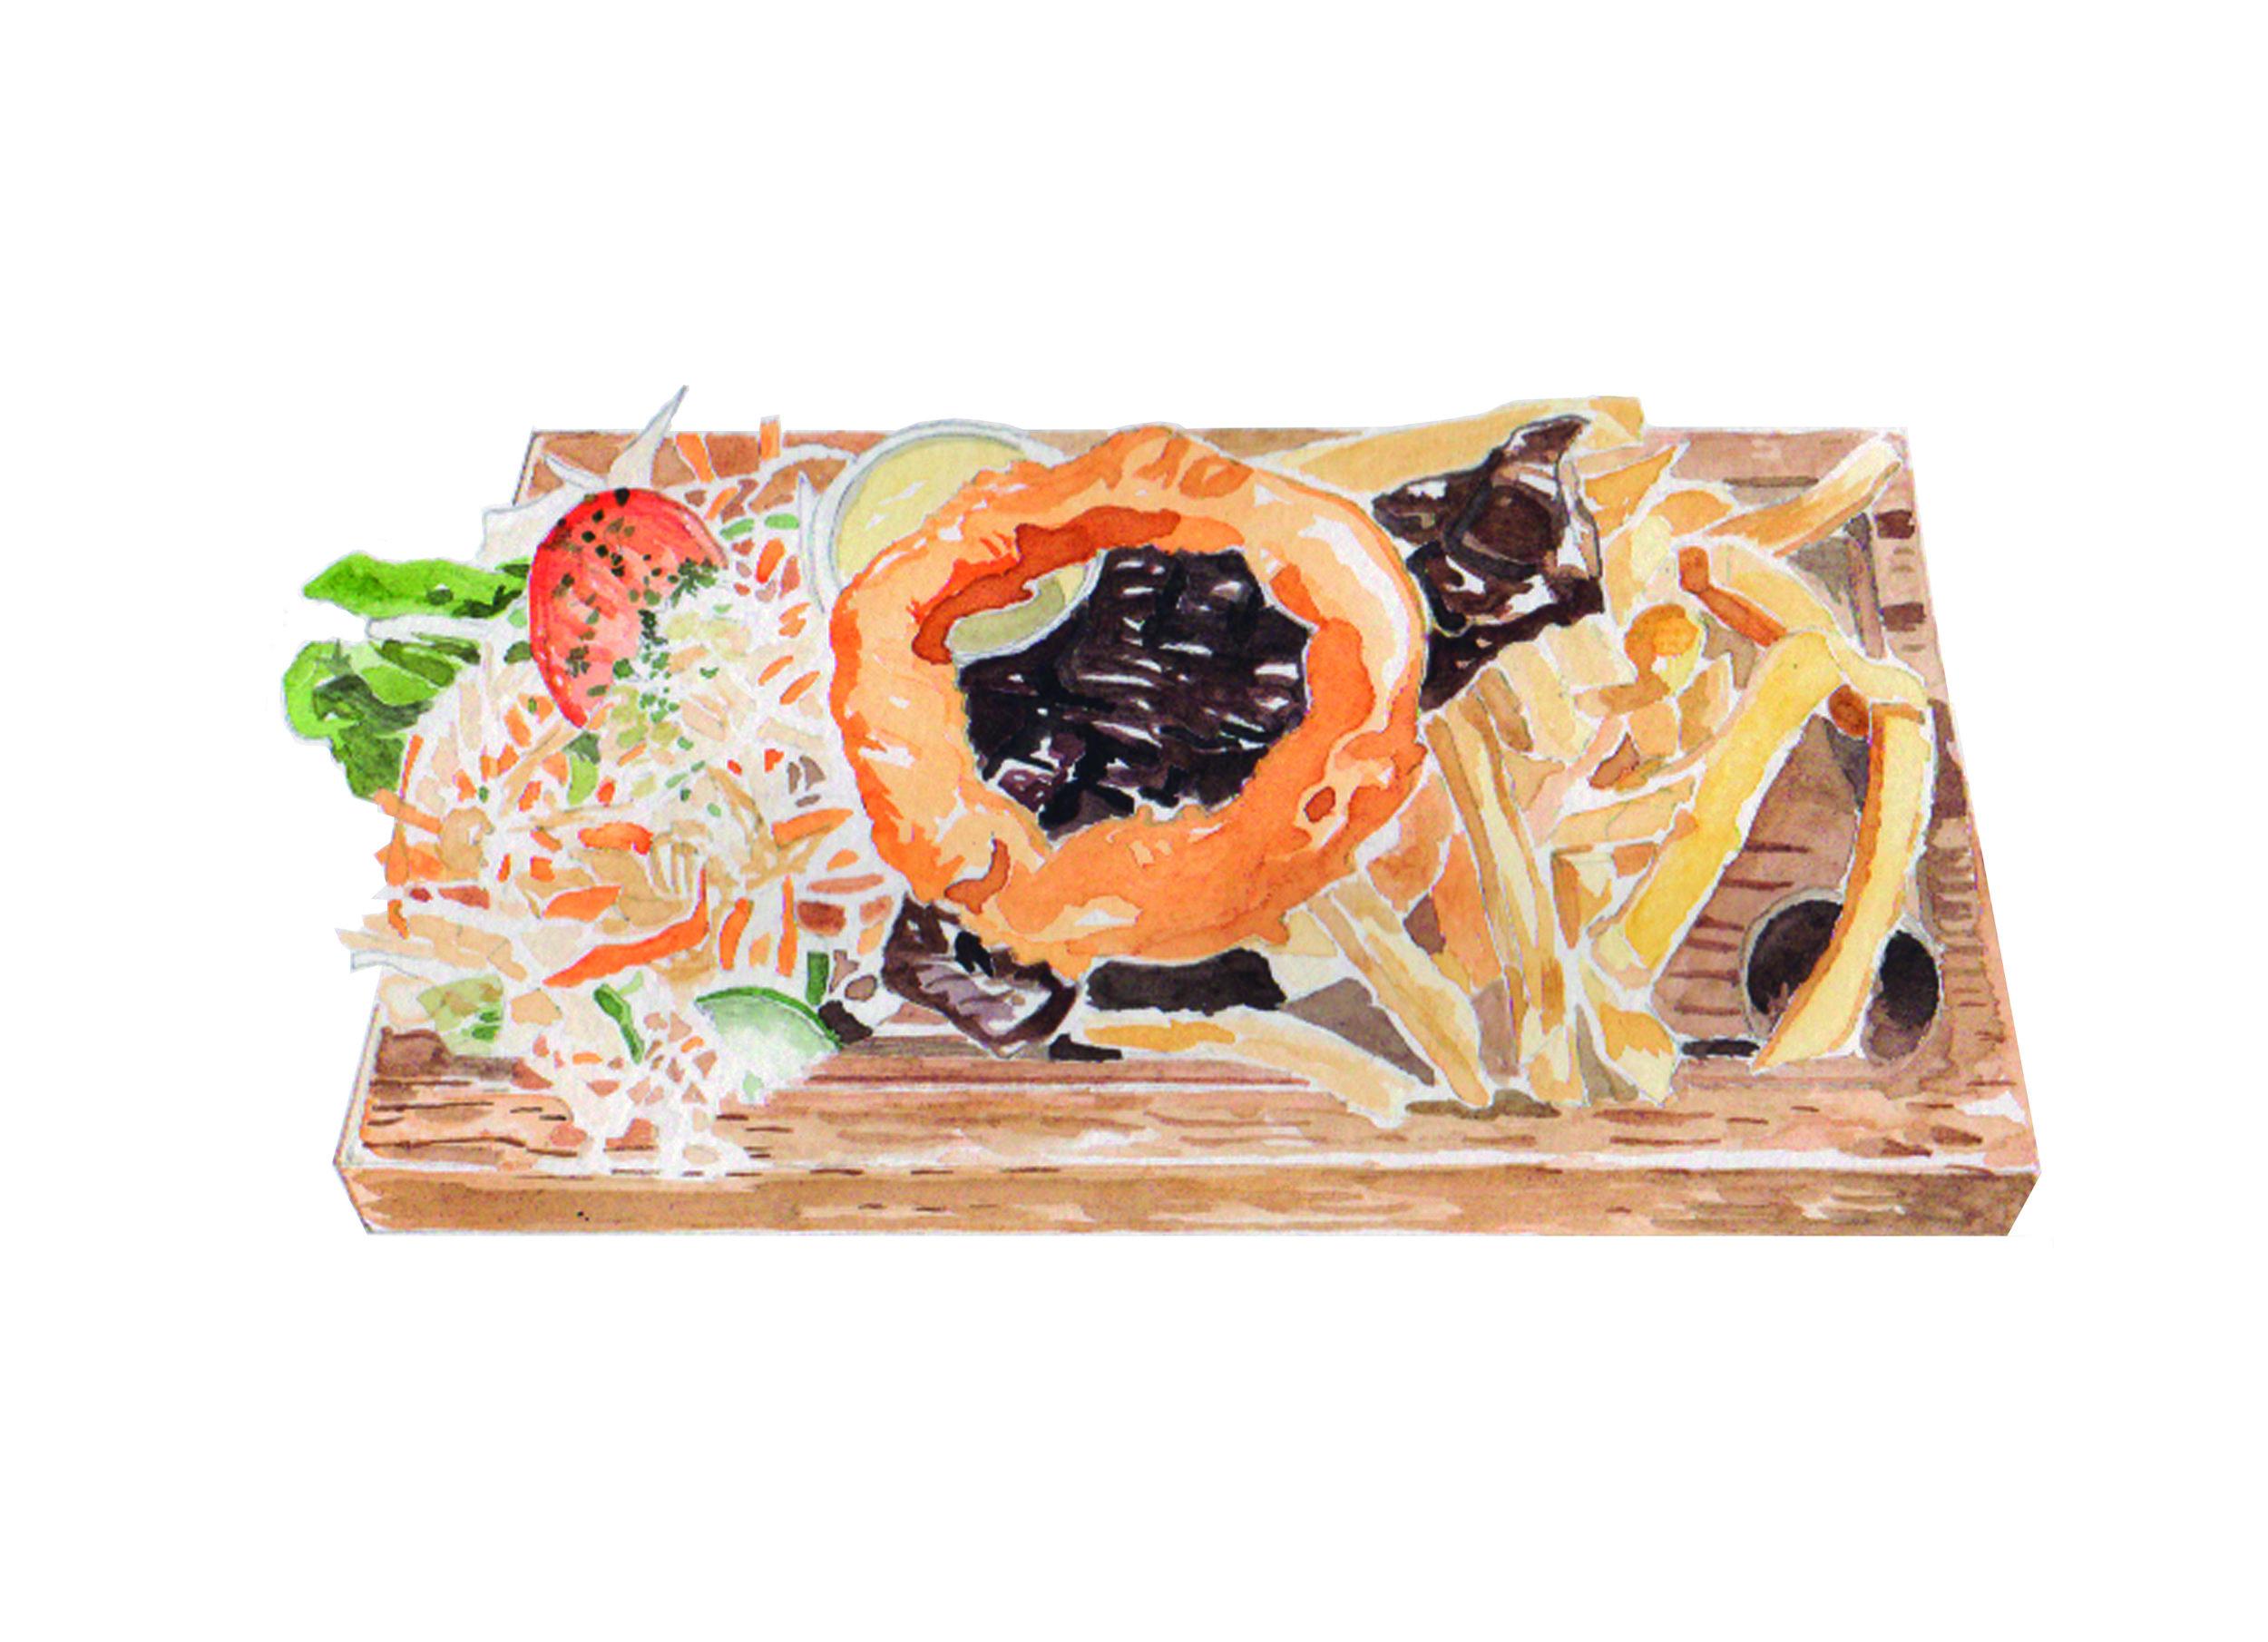 Food illustration-Steak-2019_finaltouch.jpg